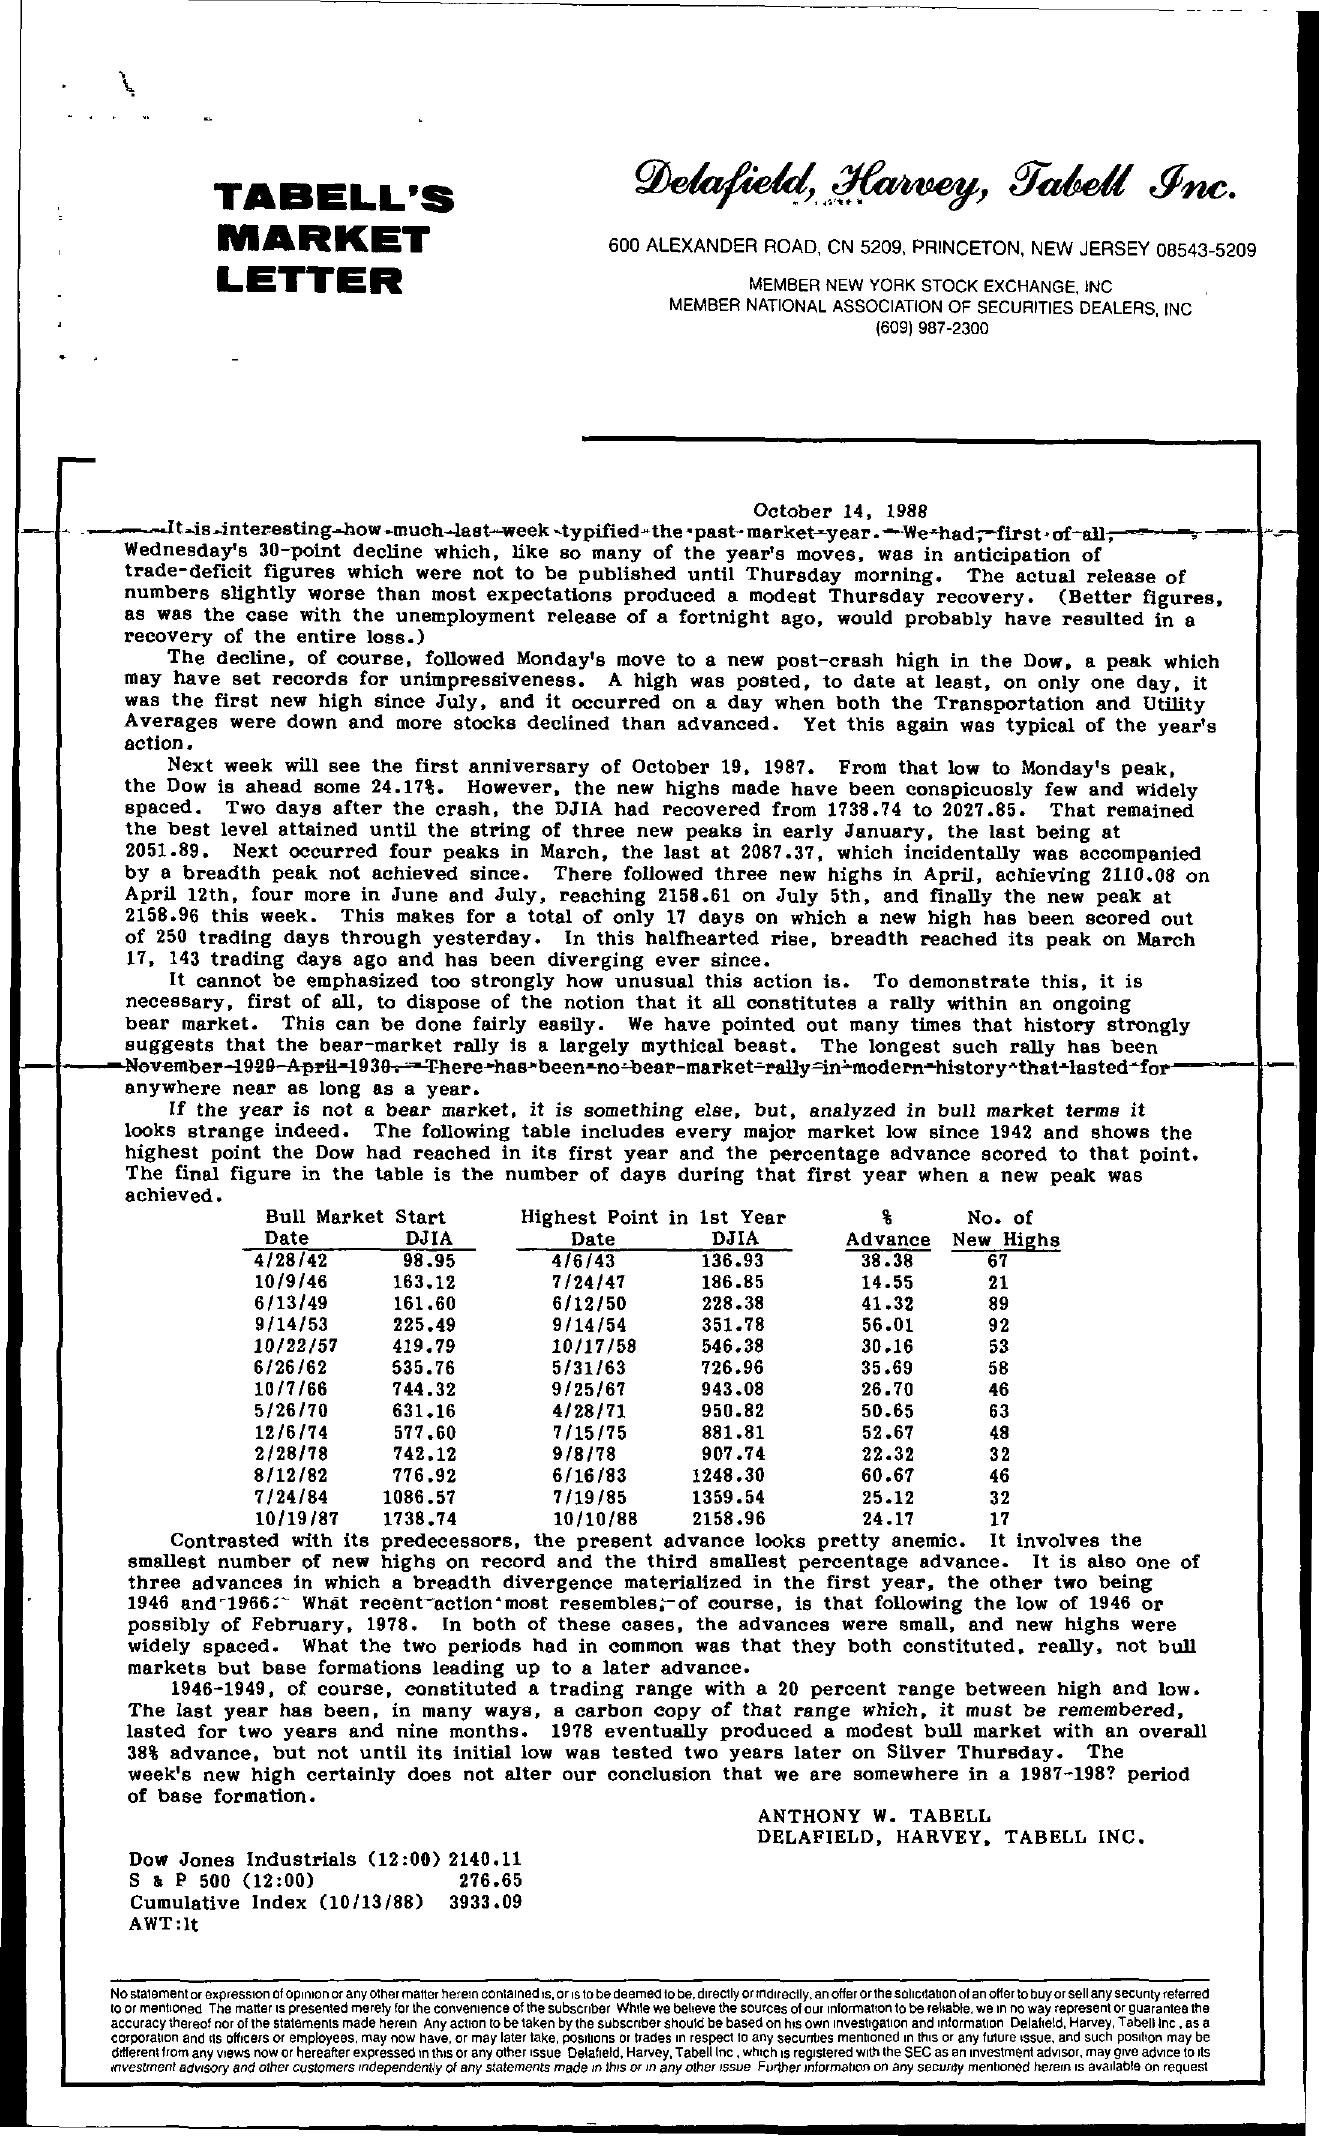 Tabell's Market Letter - October 14, 1988